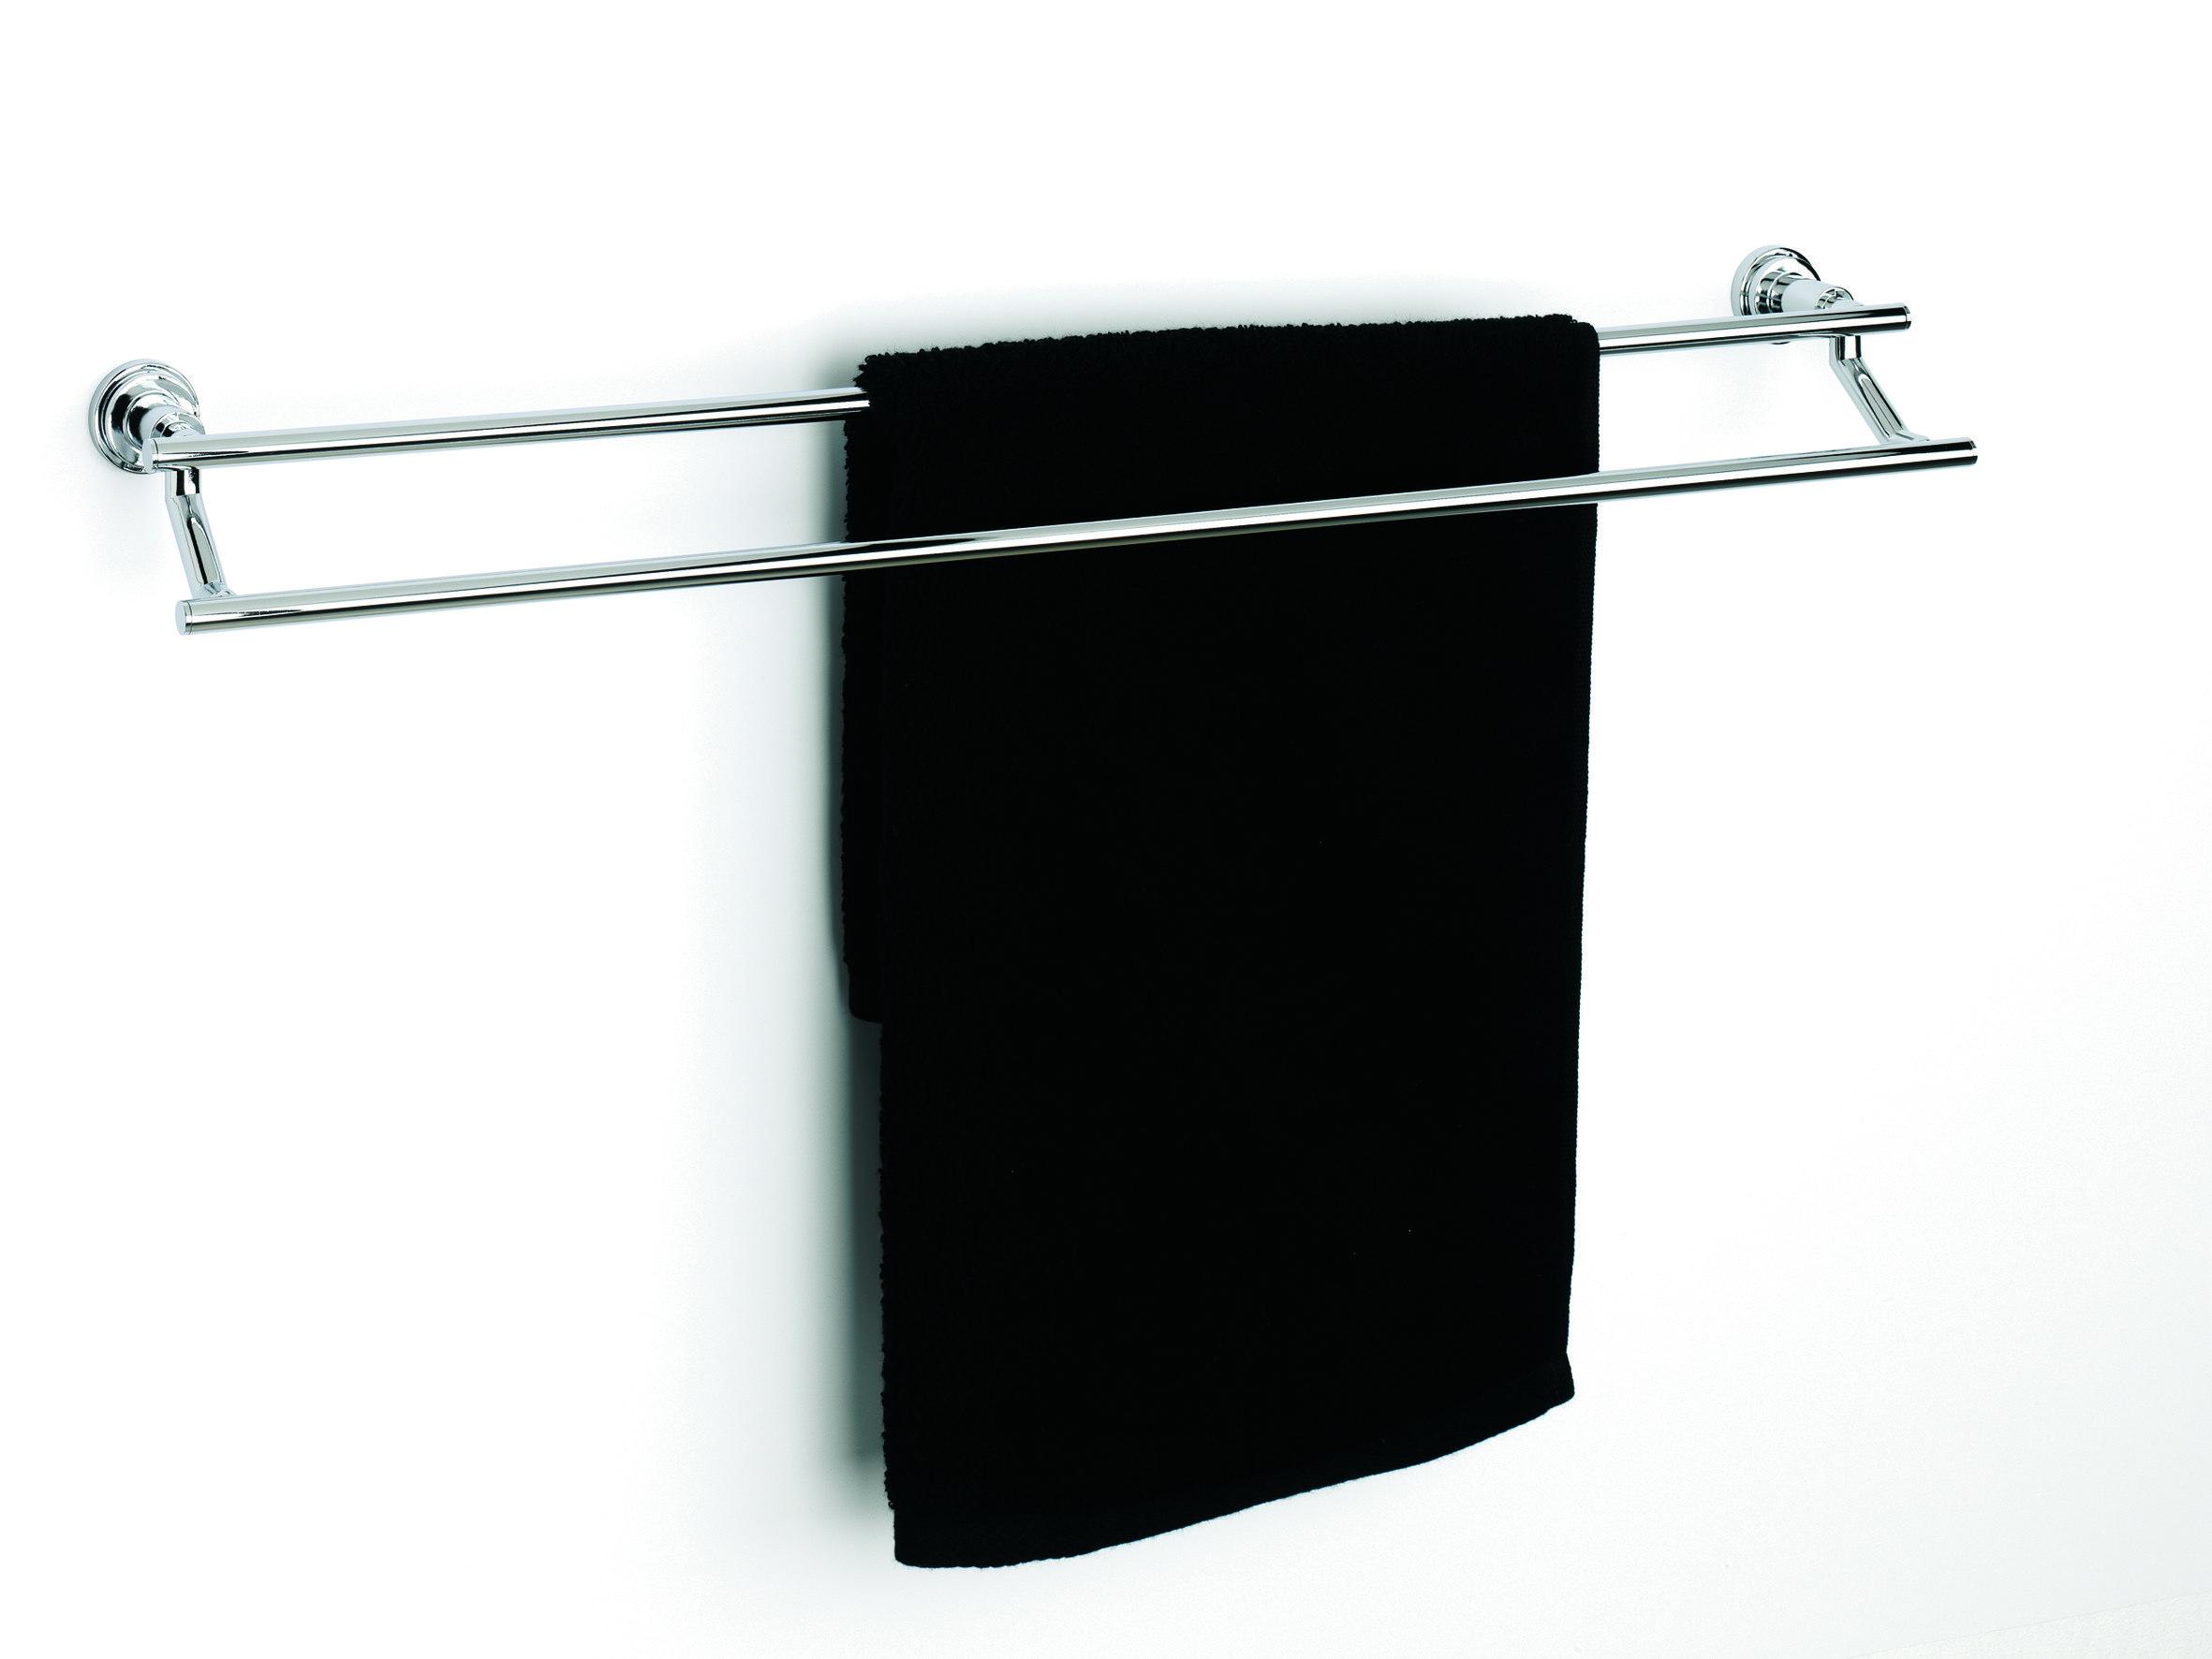 Sonia SA098644 Dynamic 24 Inch Double Towel Bar - Chrome